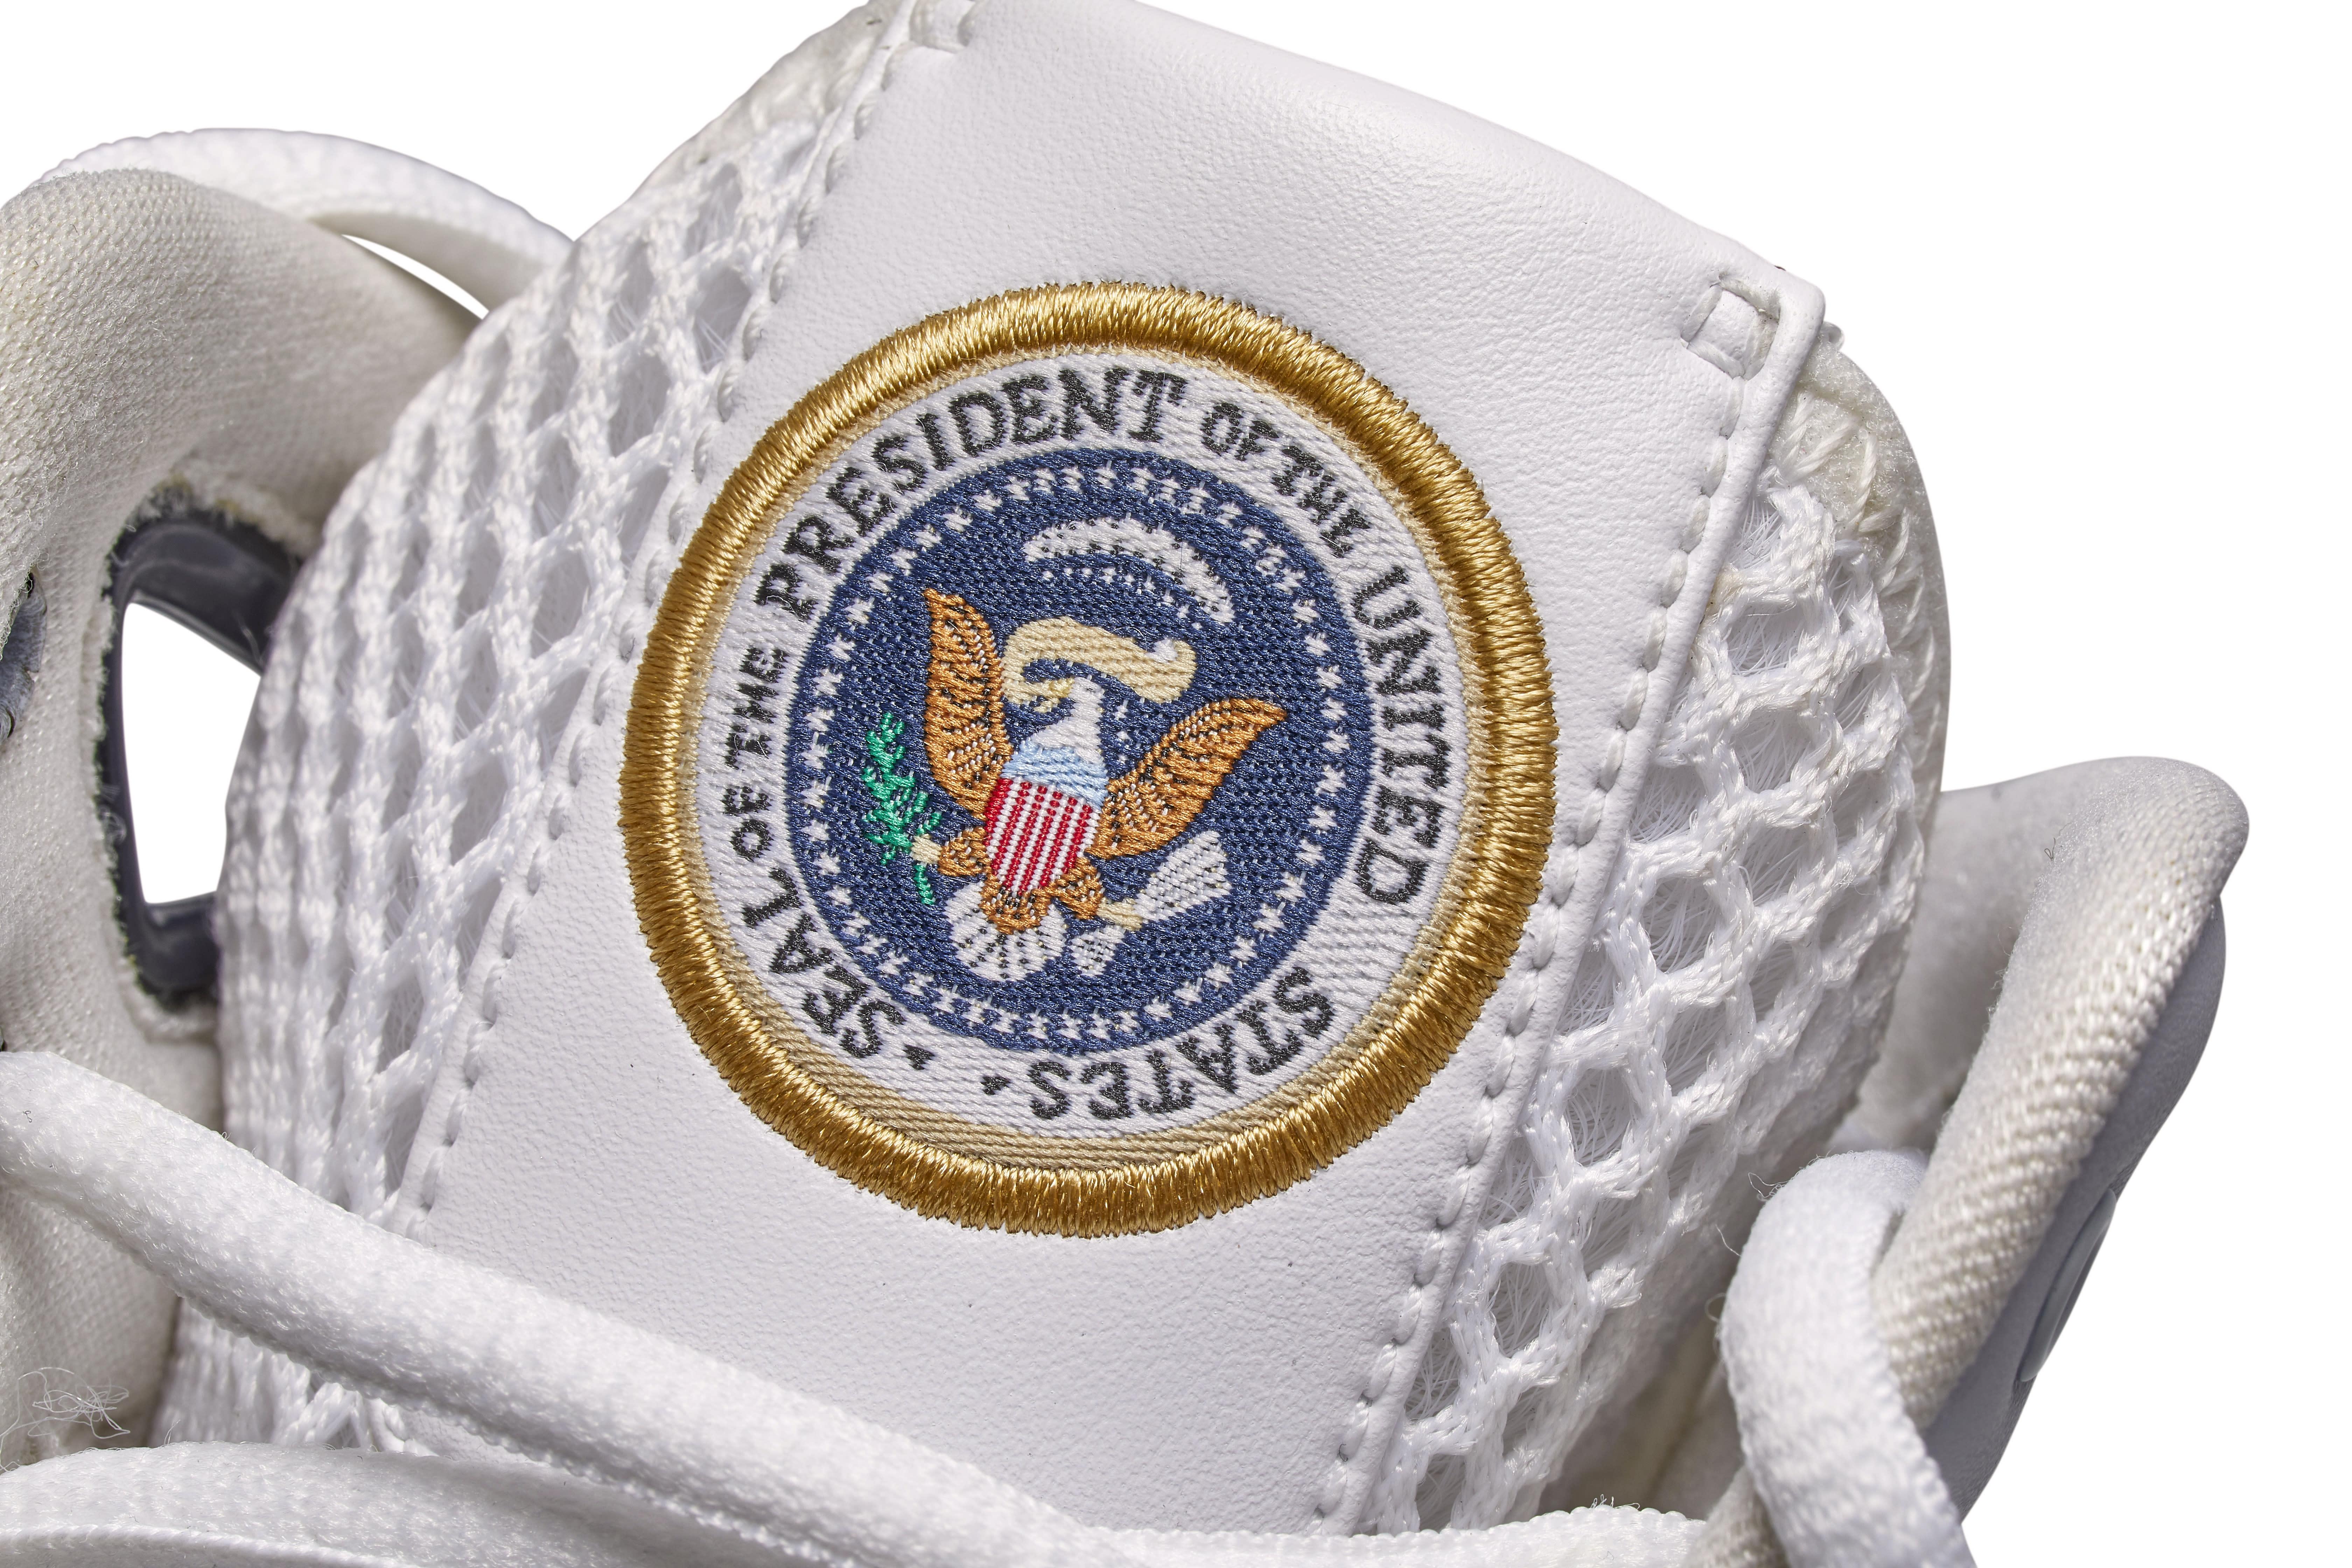 Nike Hyperdunk 'Barack Obama' PE Tongue